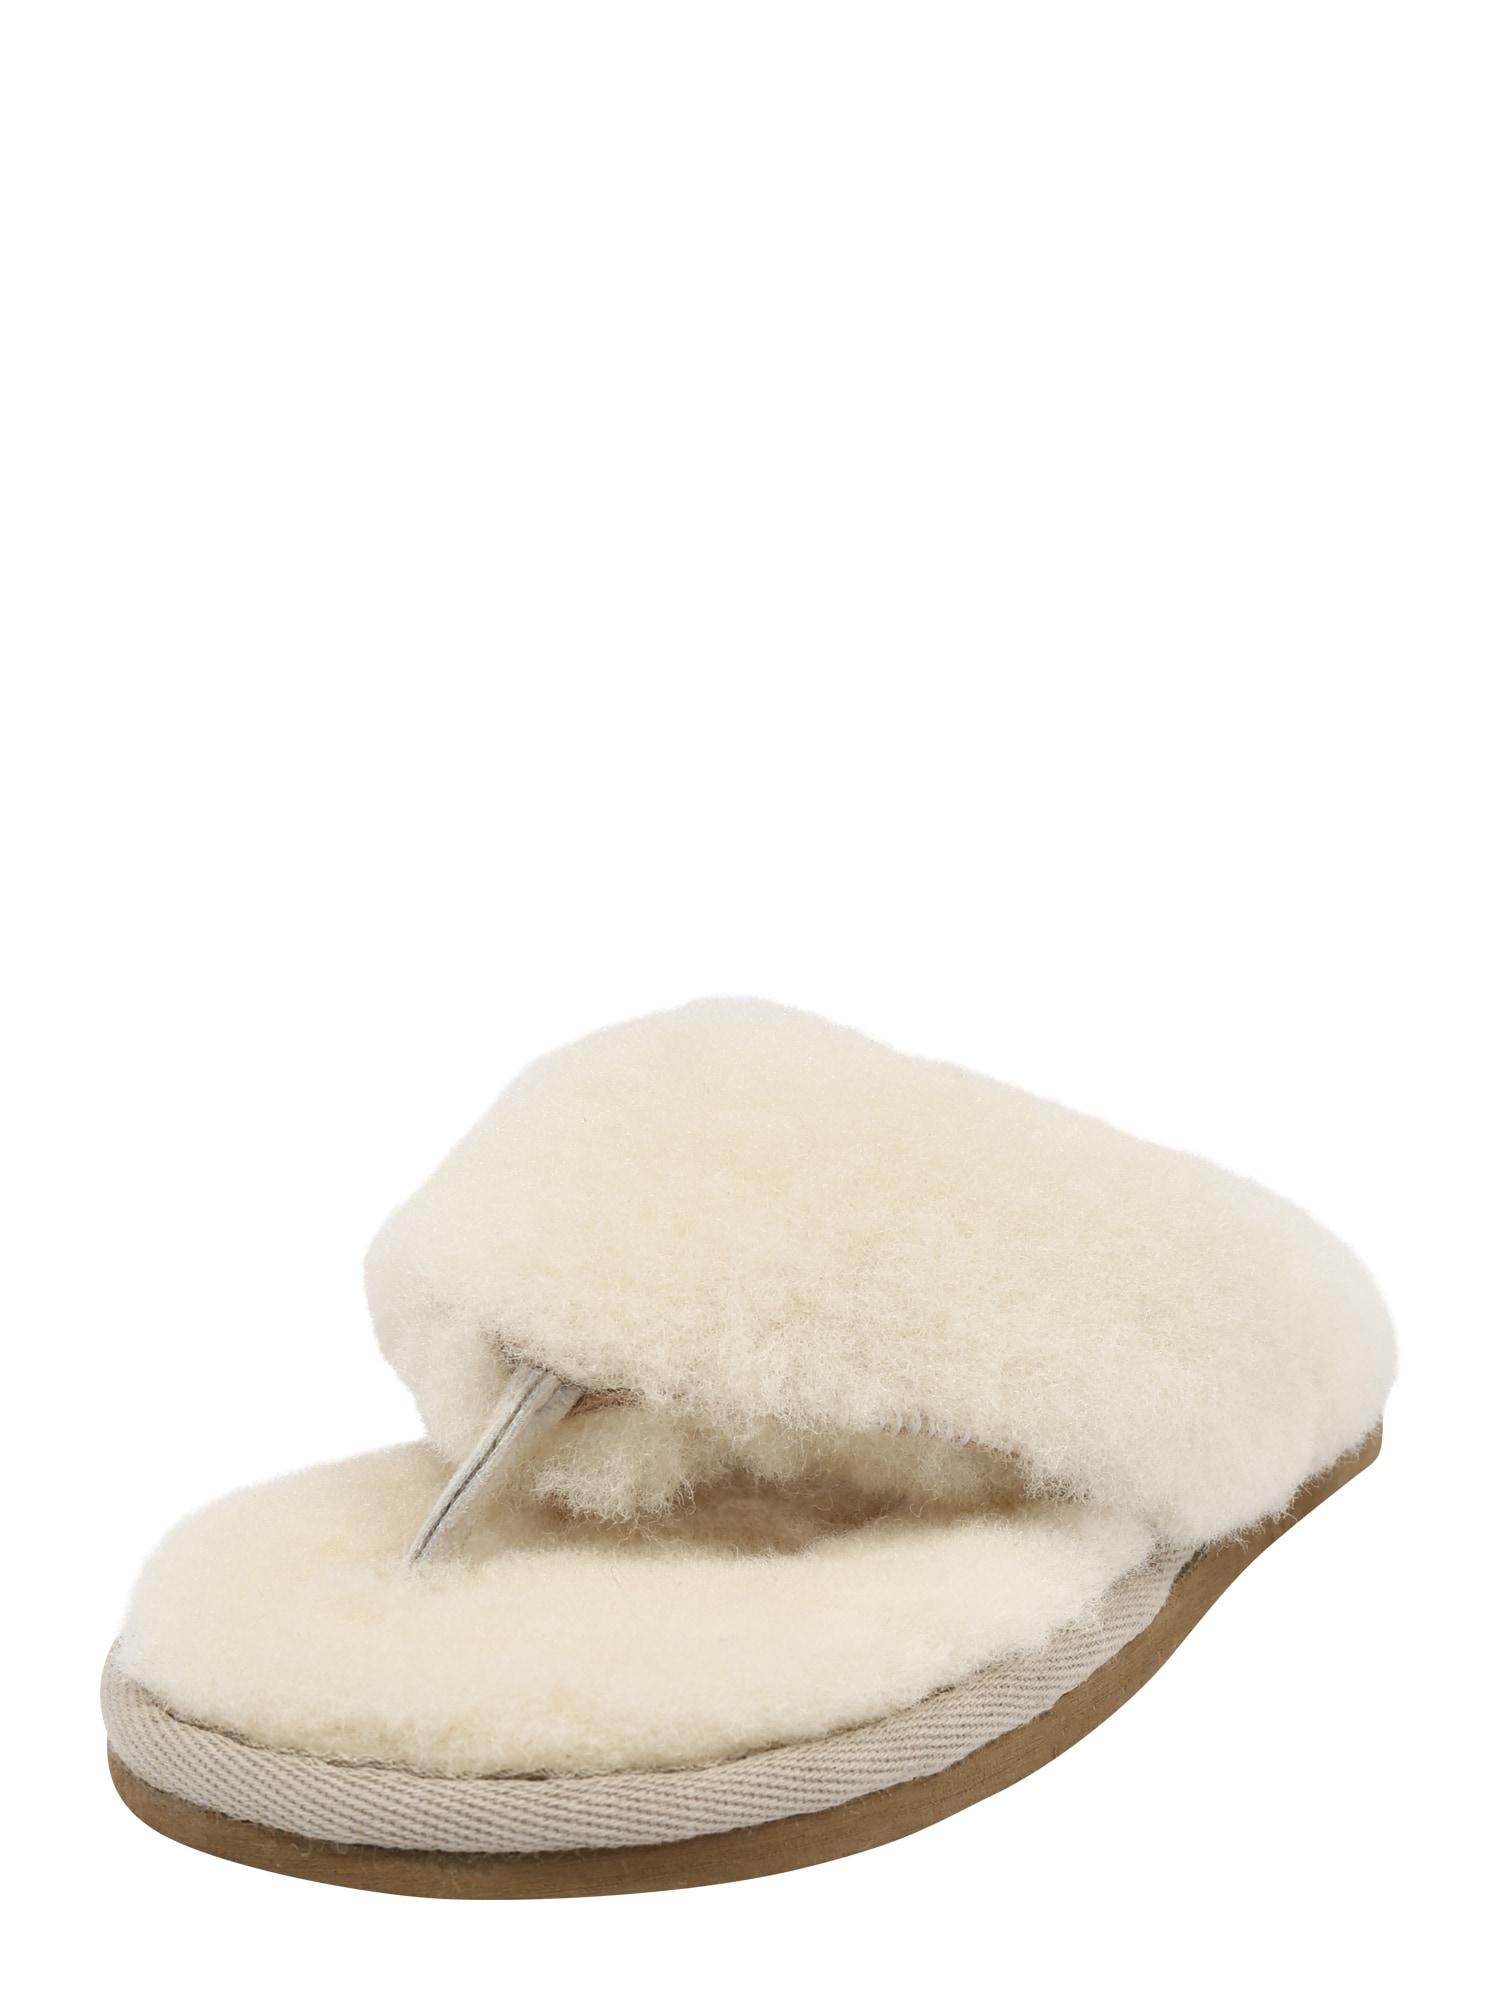 SHEPHERD OF SWEDEN Naminės šlepetės 'Pernilla' natūrali balta